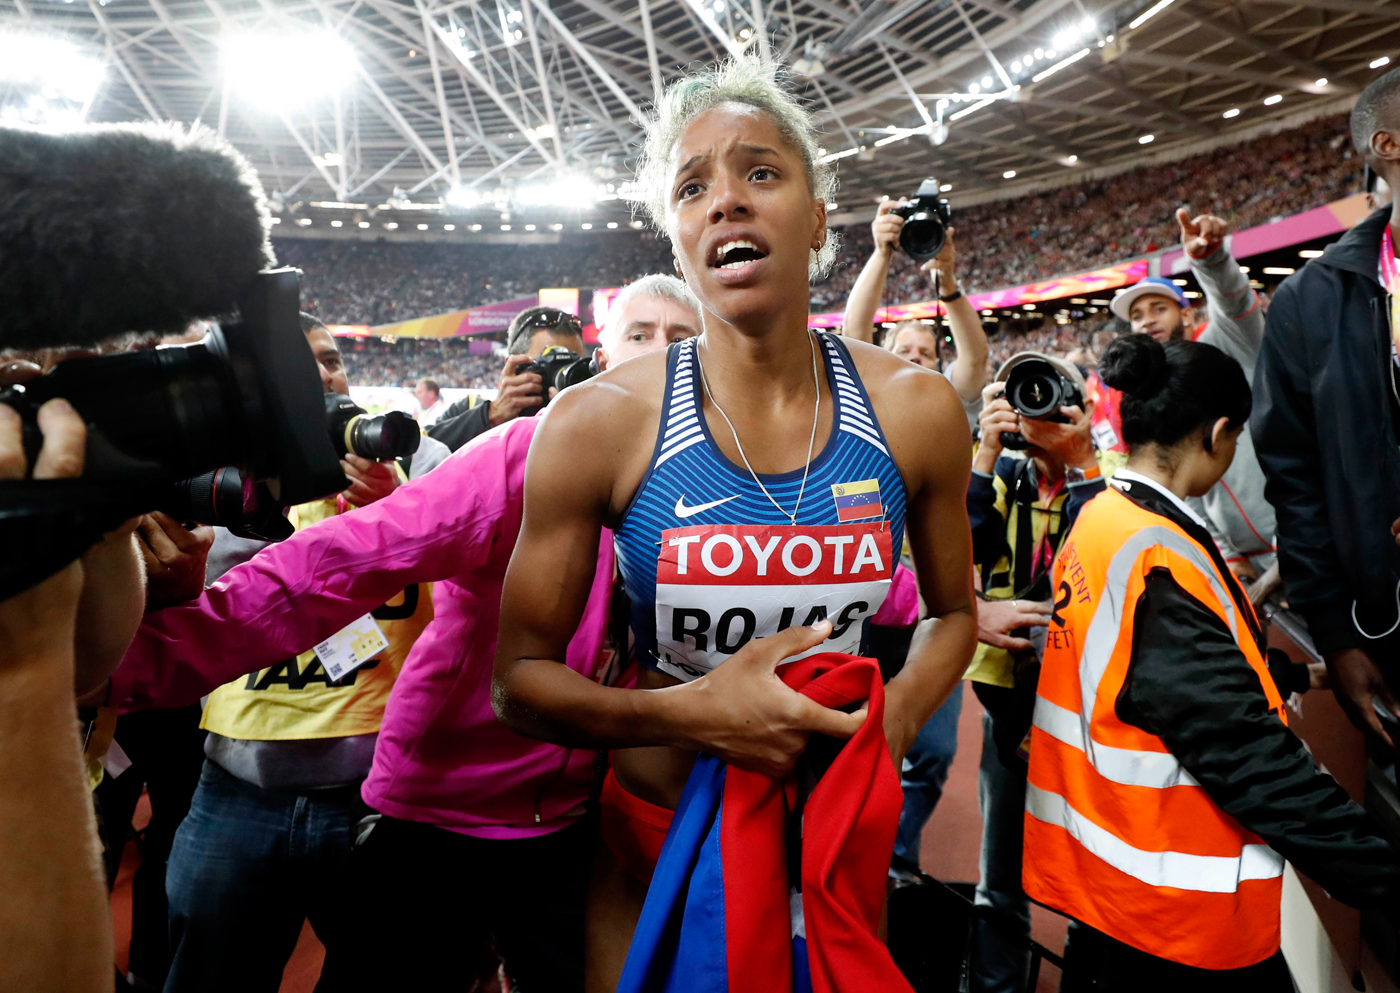 Athletics - World Athletics Championships - Women's Triple Jump Final – London Stadium, London, Britain - August 7, 2017. Yulimar Rojas of Venezuela celebrates winning gold. REUTERS/Phil Noble